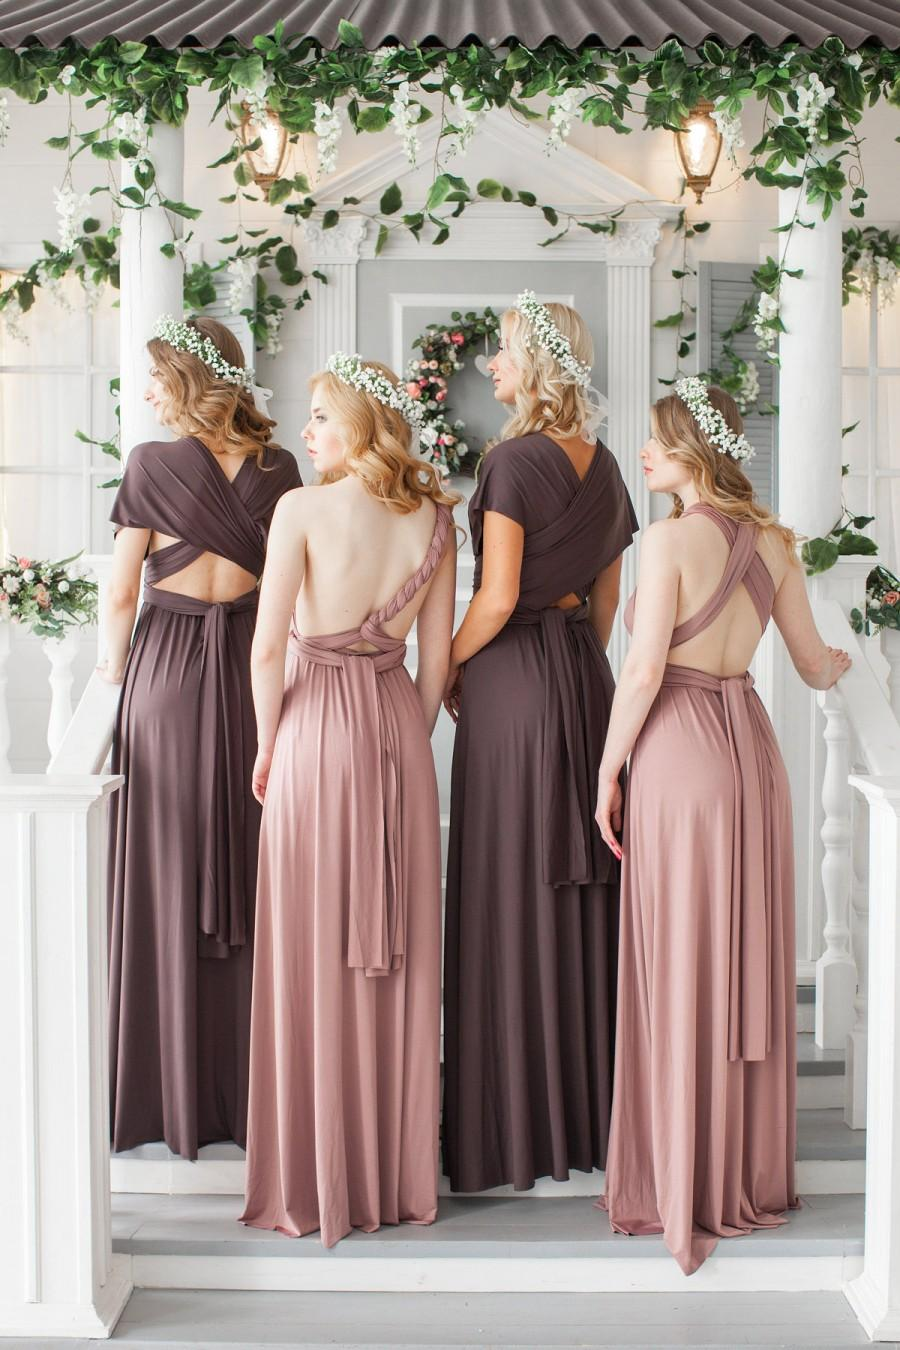 Hochzeit - Sage infinity dress, Green Bridesmaid dress, prom dress, mint, twist dress, convertible dresses, cocktail dresses, multiway dress